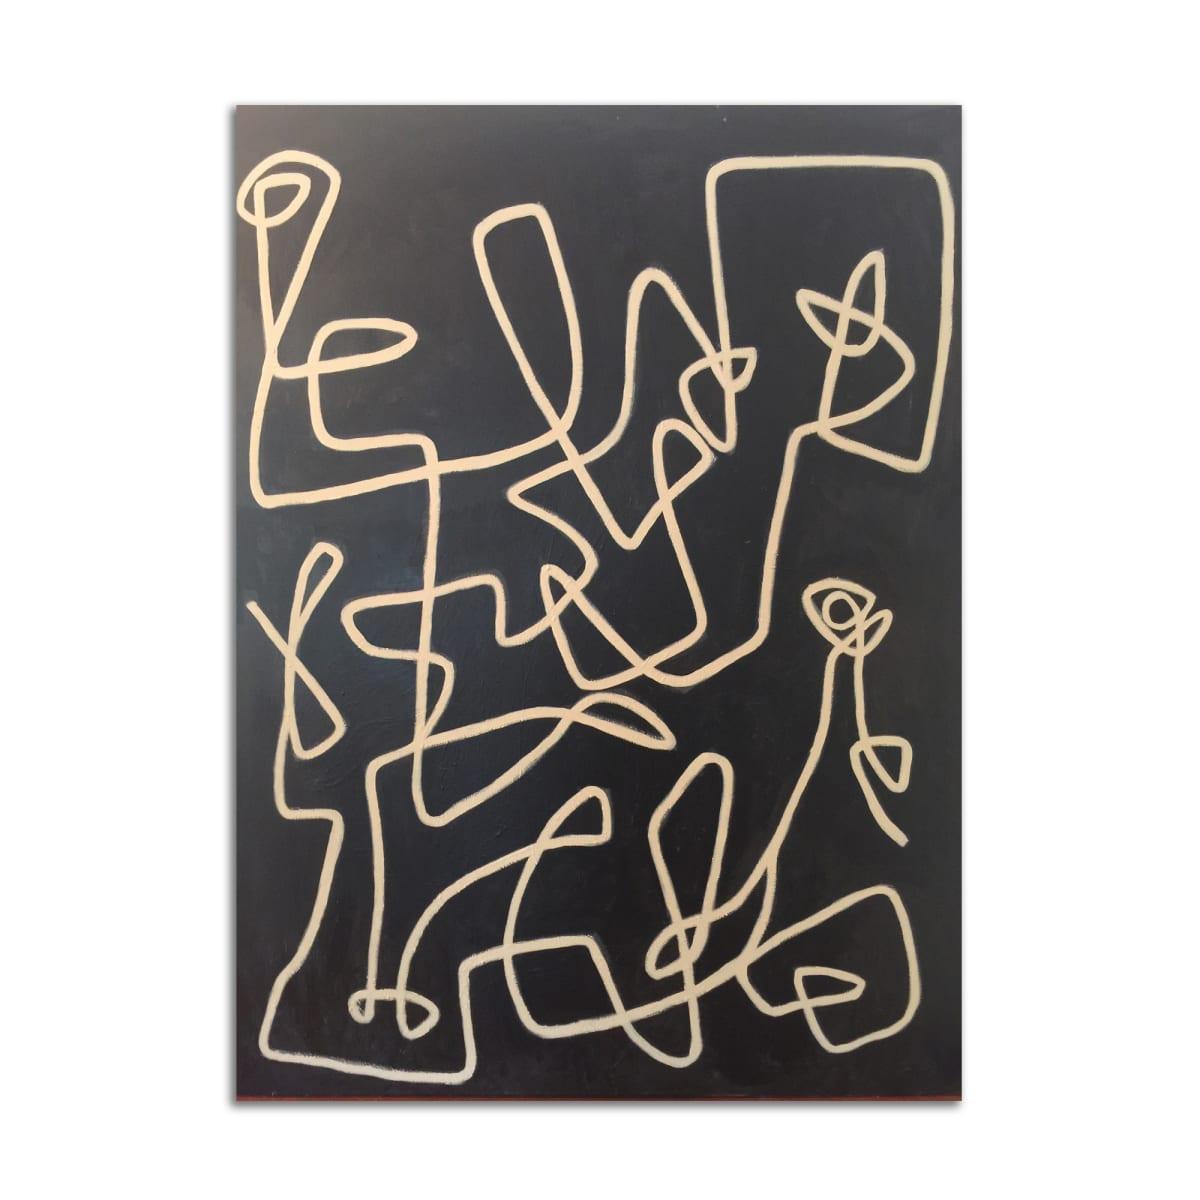 Untitled II by Rosie Winstead